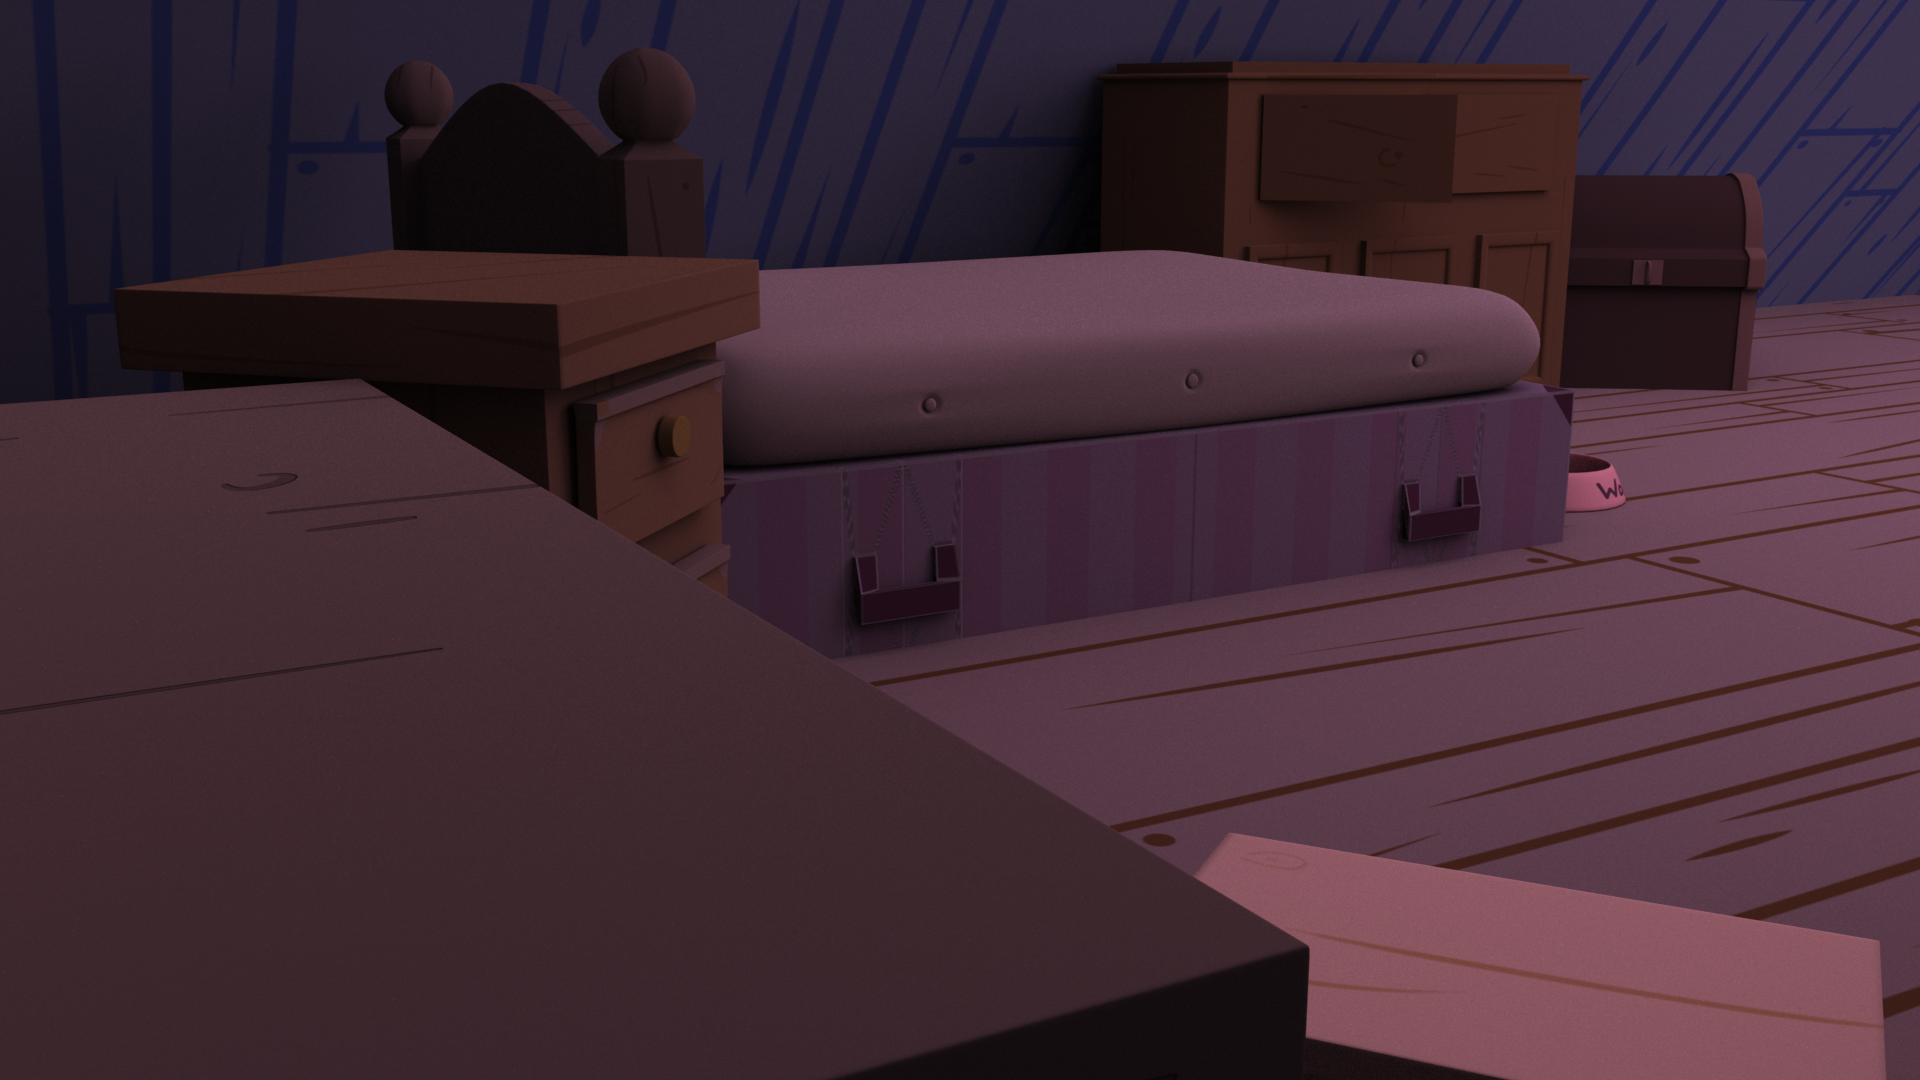 Gravity Falls Bedroom Mock Up - #5